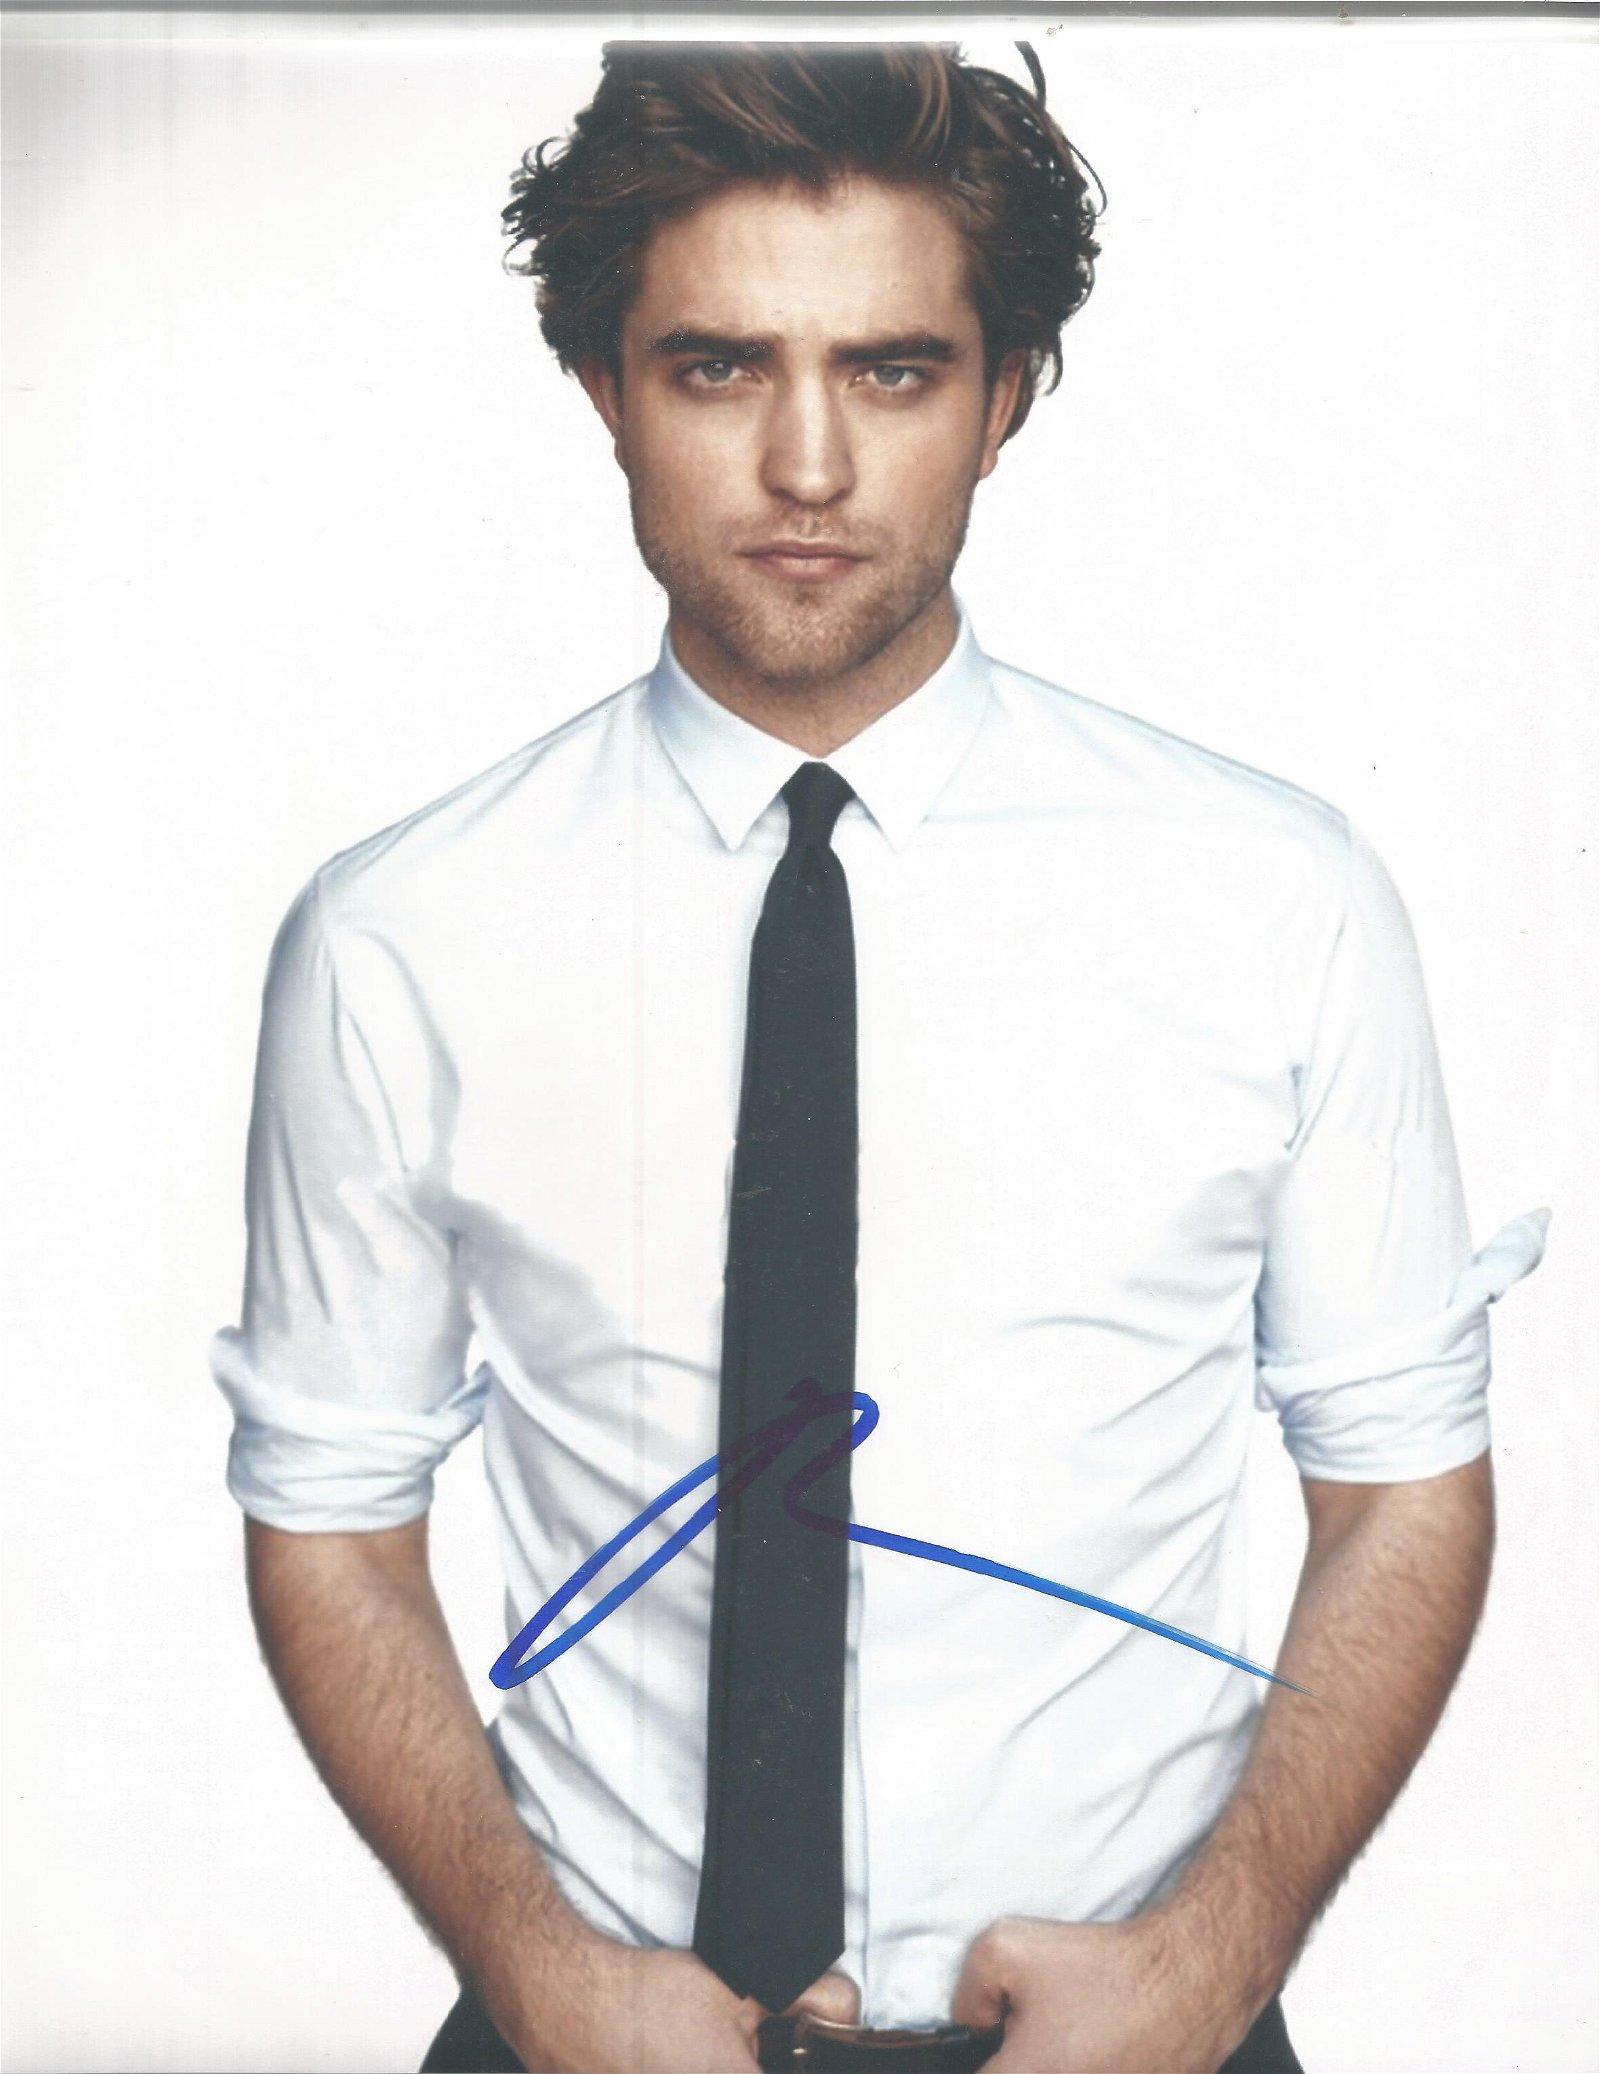 Robert Pattinson signed 10x8 colour photo. Good